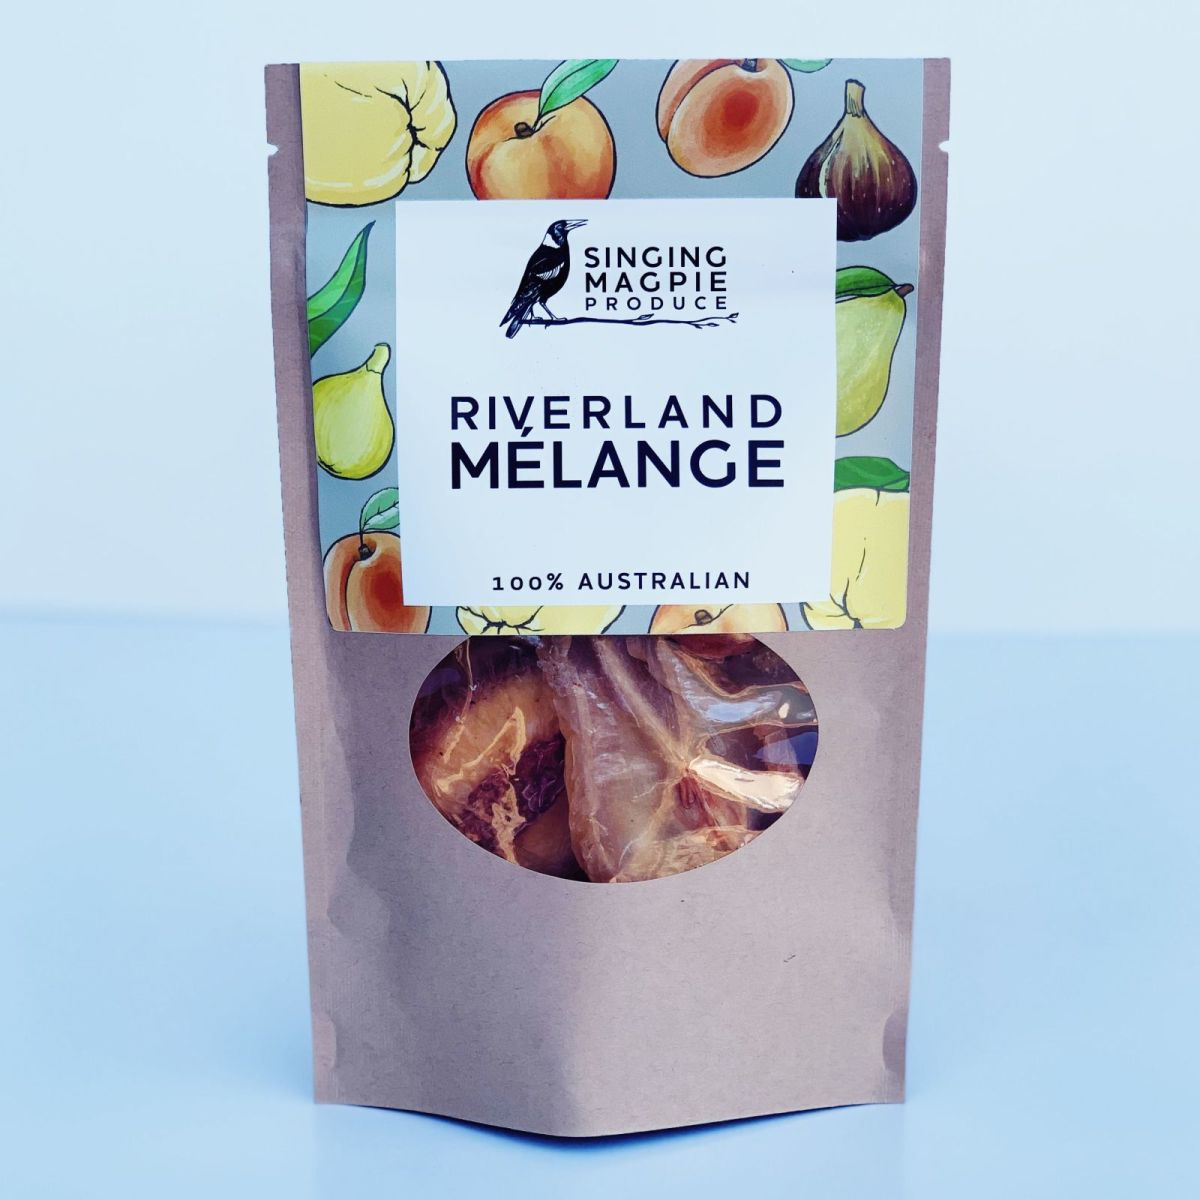 Singing Magpie Produce - Riverland Mélange